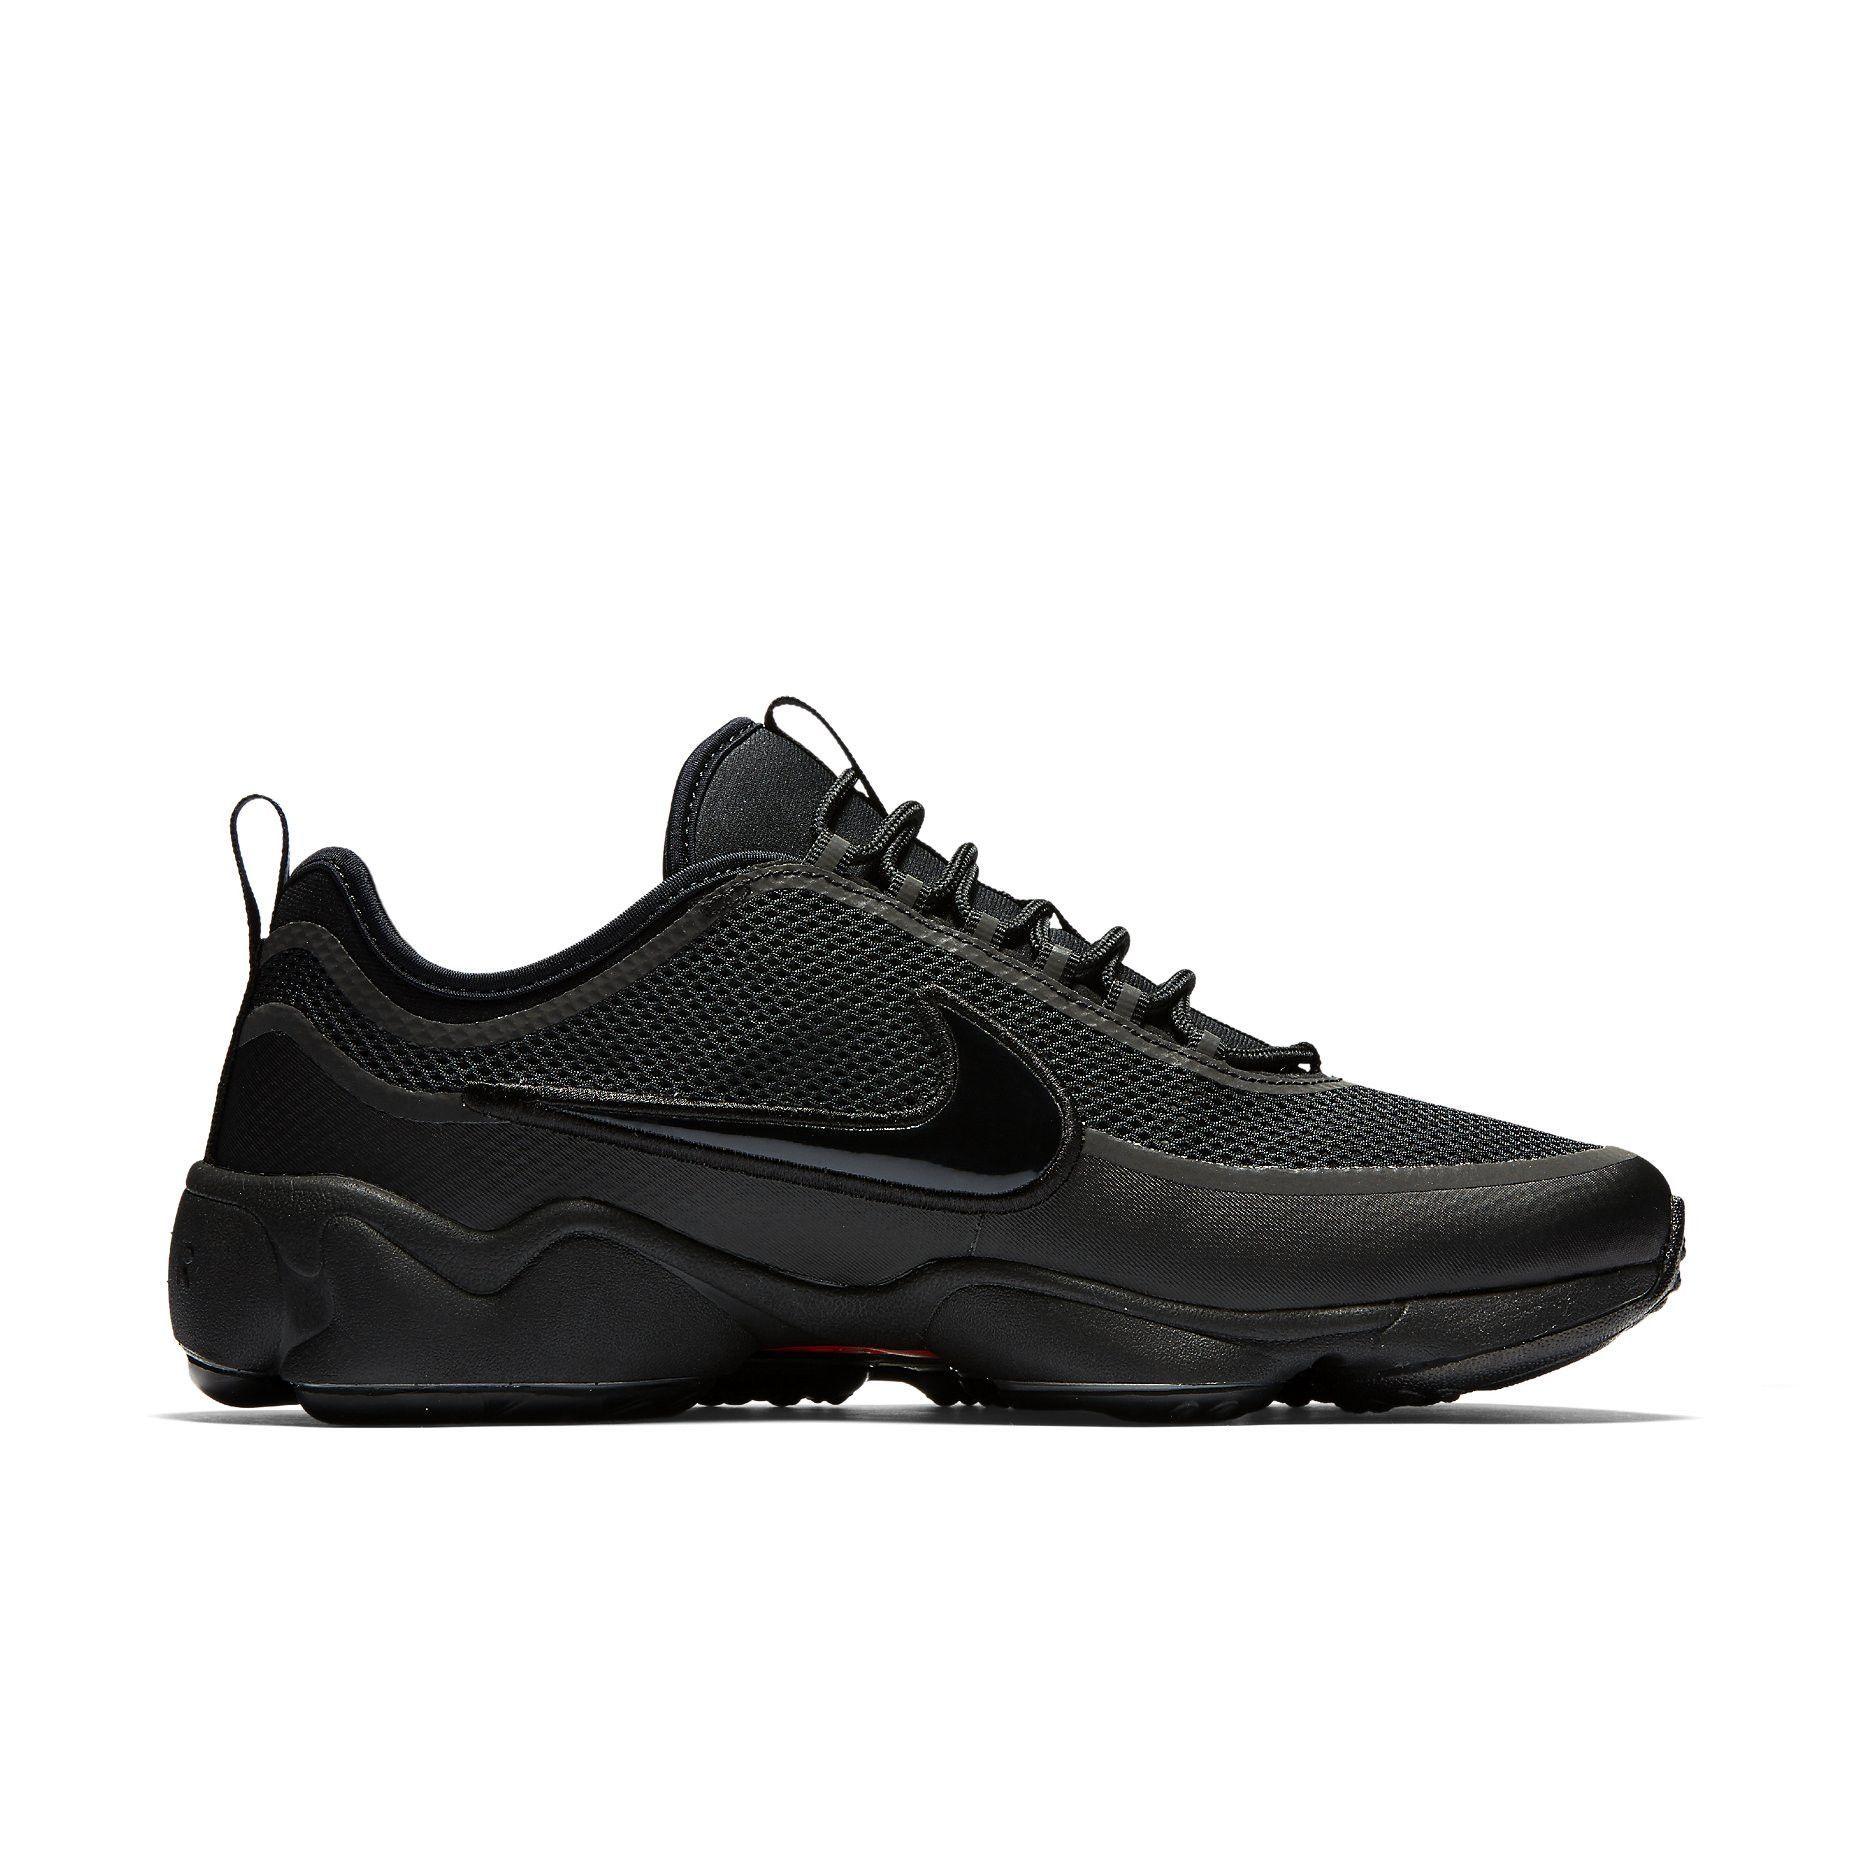 Nike Air Zoom Spiridon Ultra ( Black Black Bright Crimson ) 91fcf7c436bae